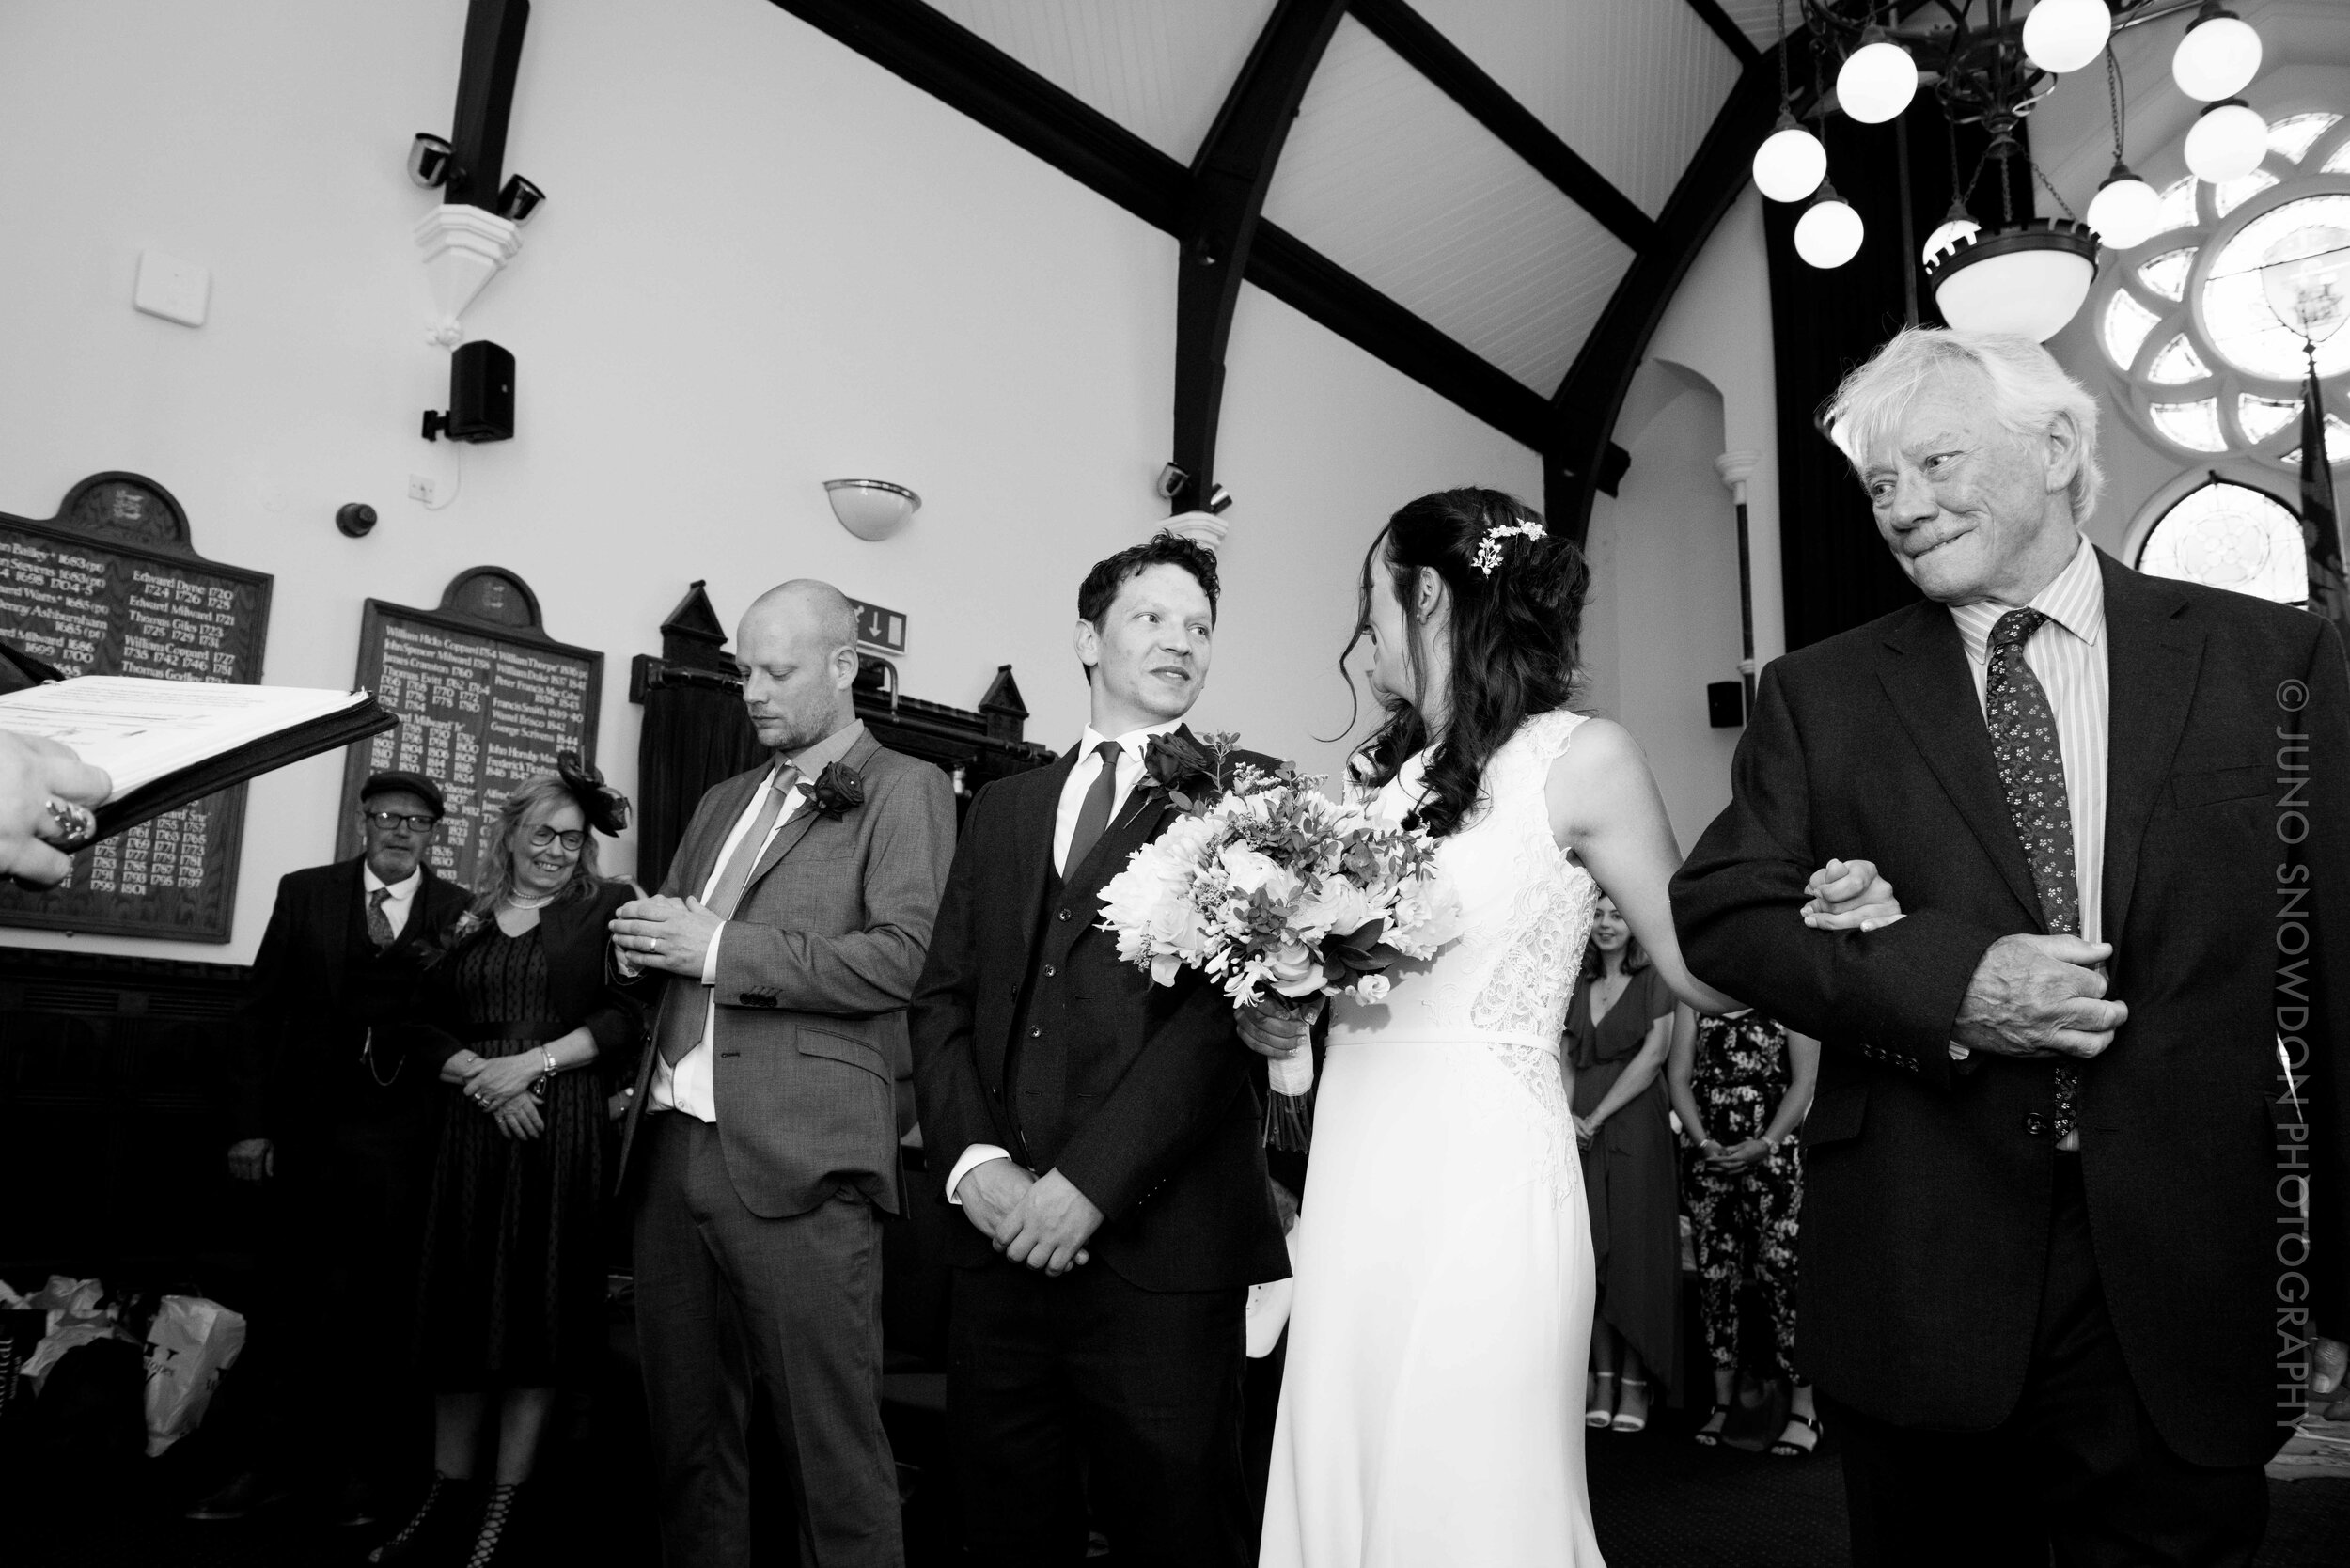 juno-snowdon-photography-wedding-7237.jpg